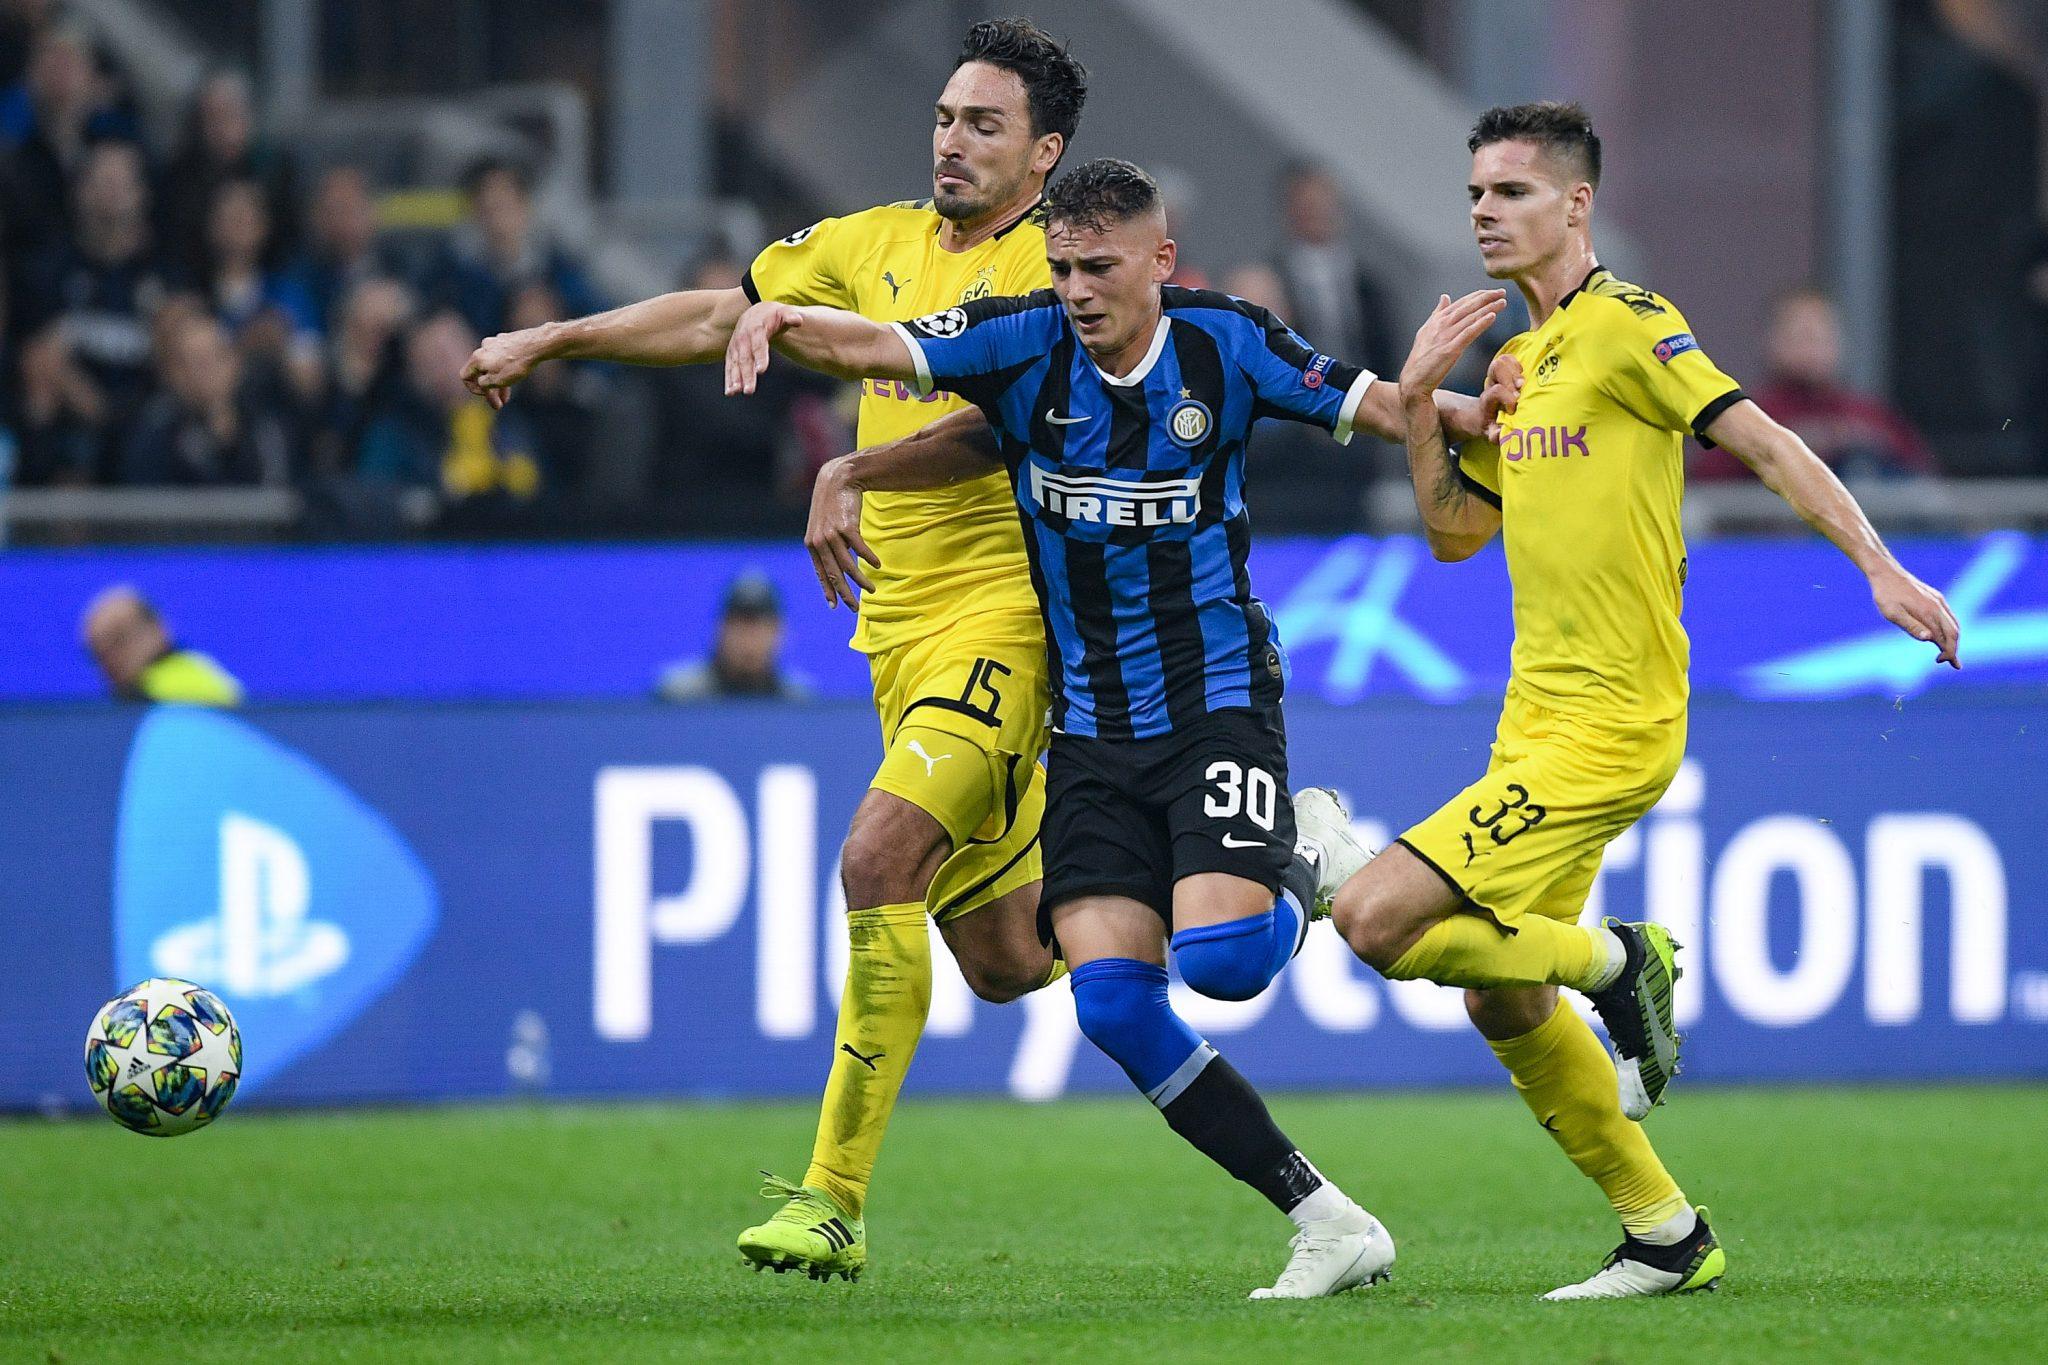 Esposito Inter - Foto Giuseppe Maffia Imago OneFootball